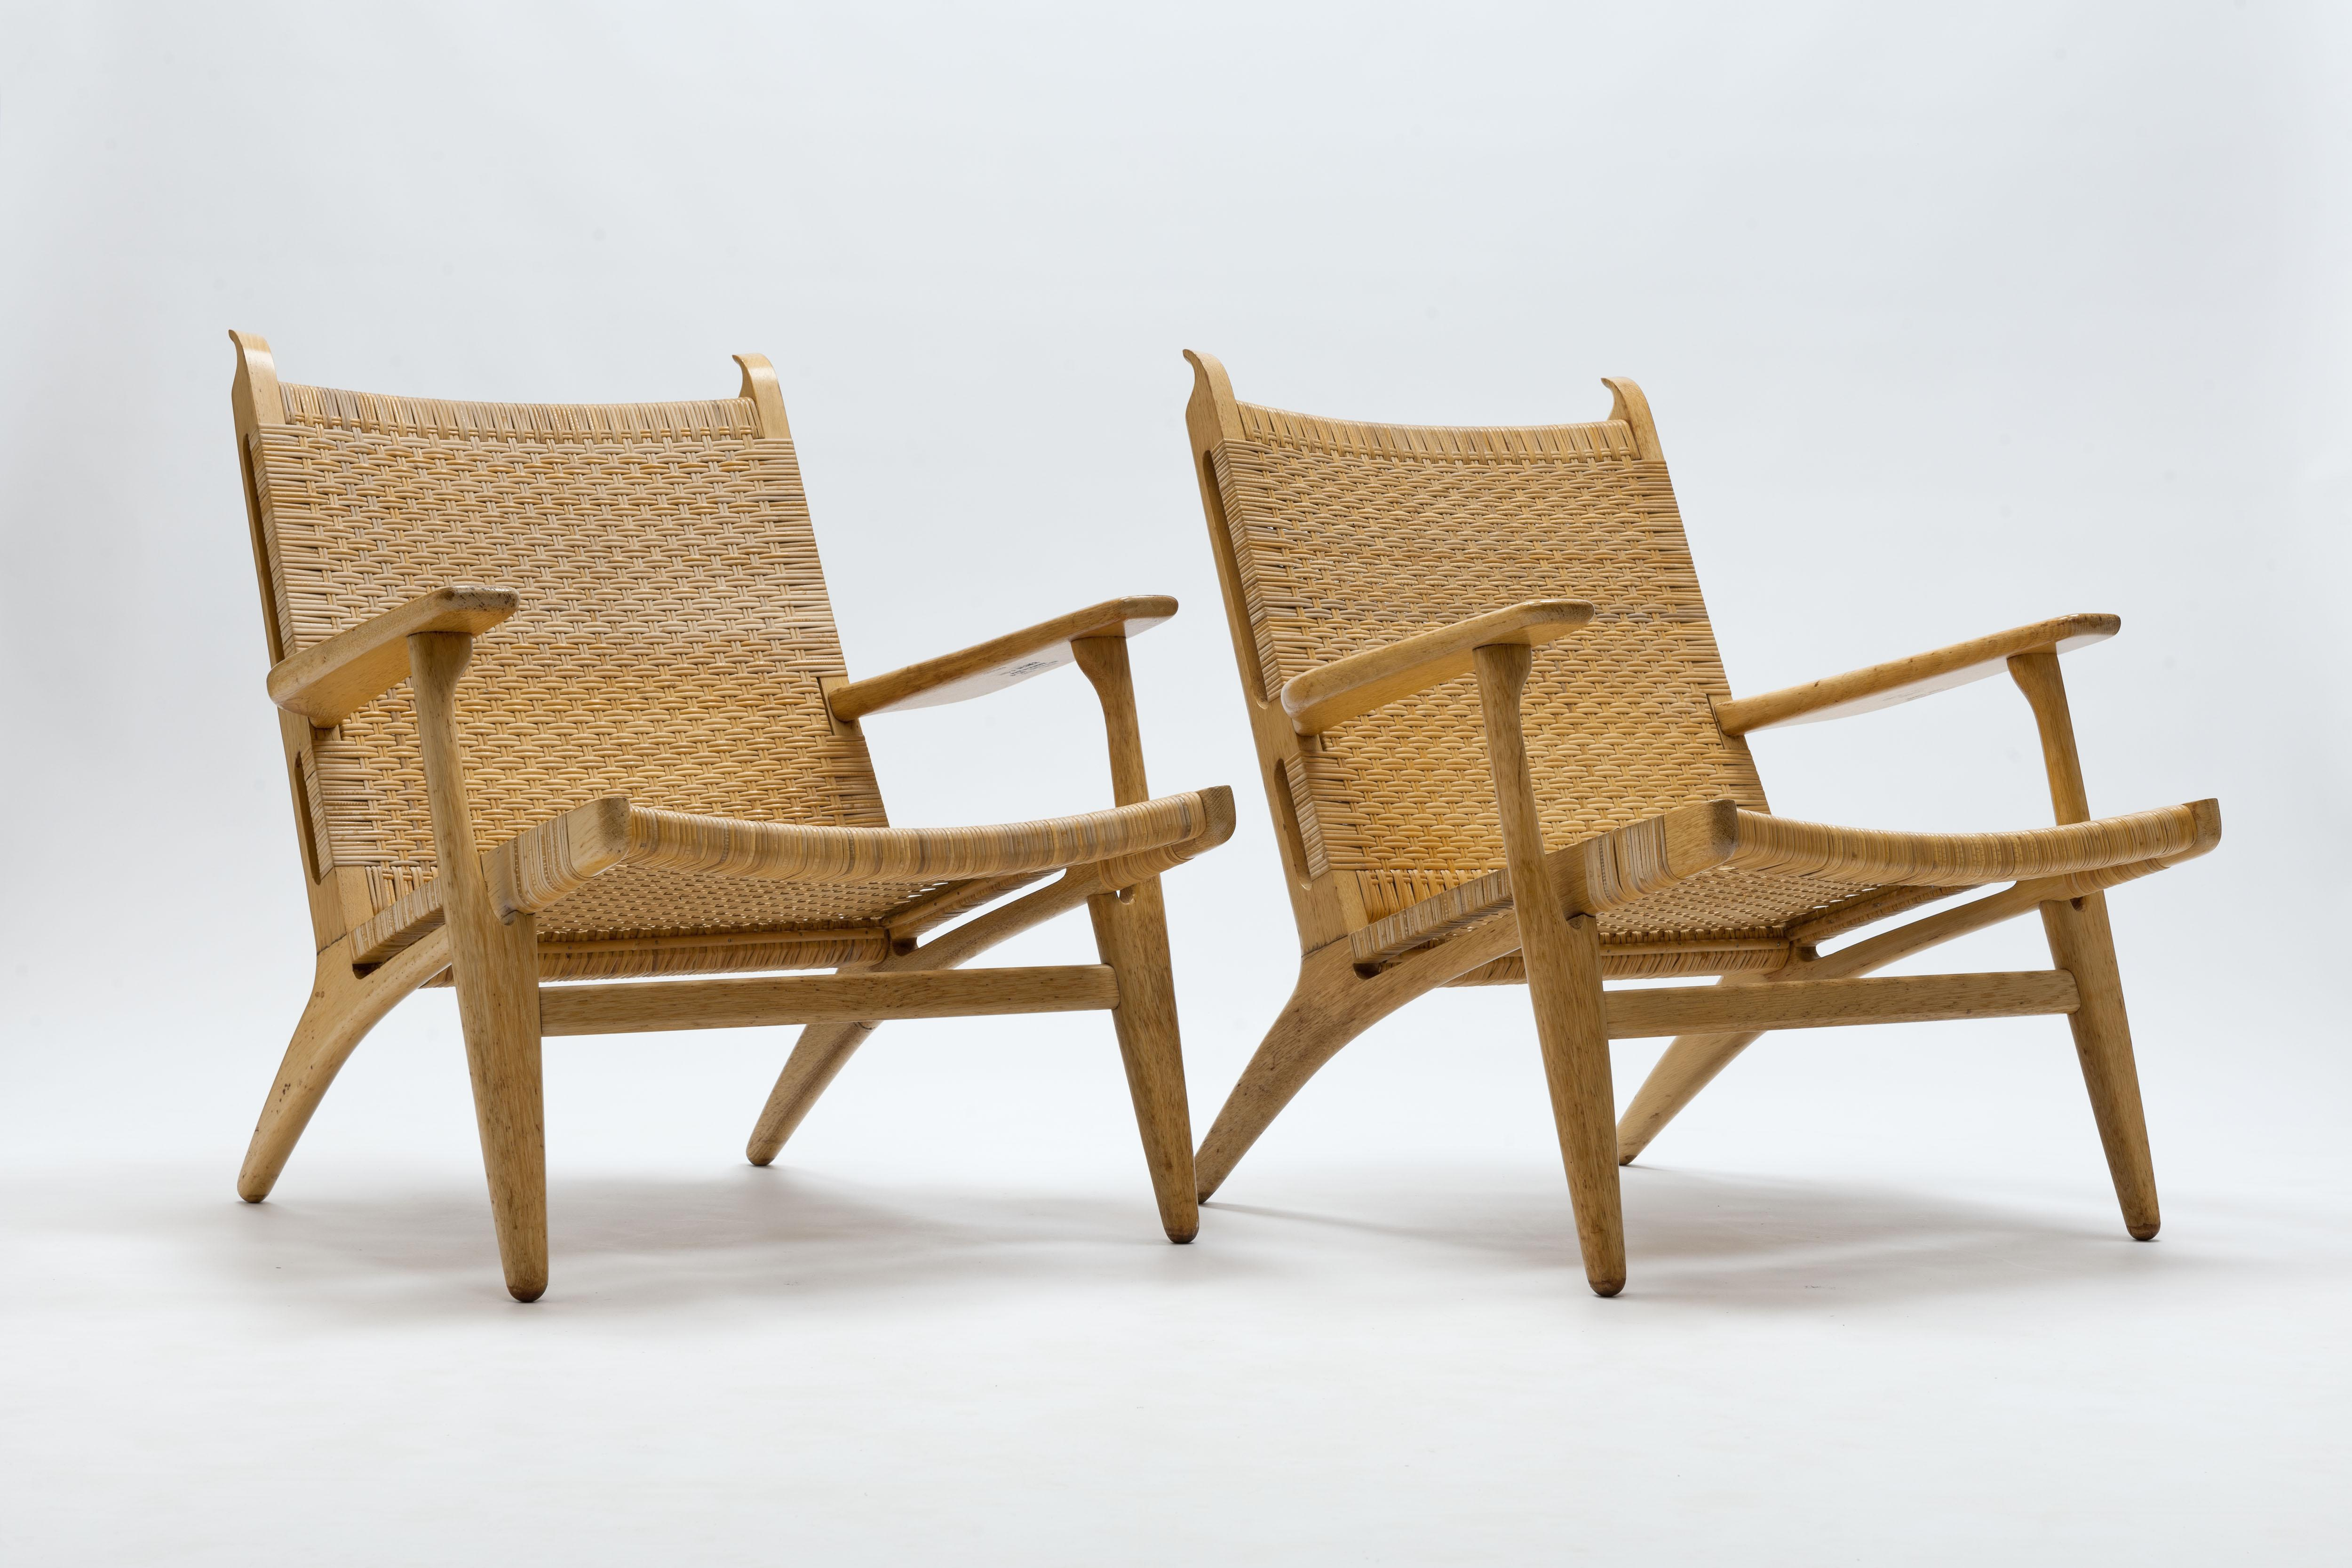 Hans Wegner Stoel : Pair of cane and oak hans wegner ch lounge chairs carl hansen